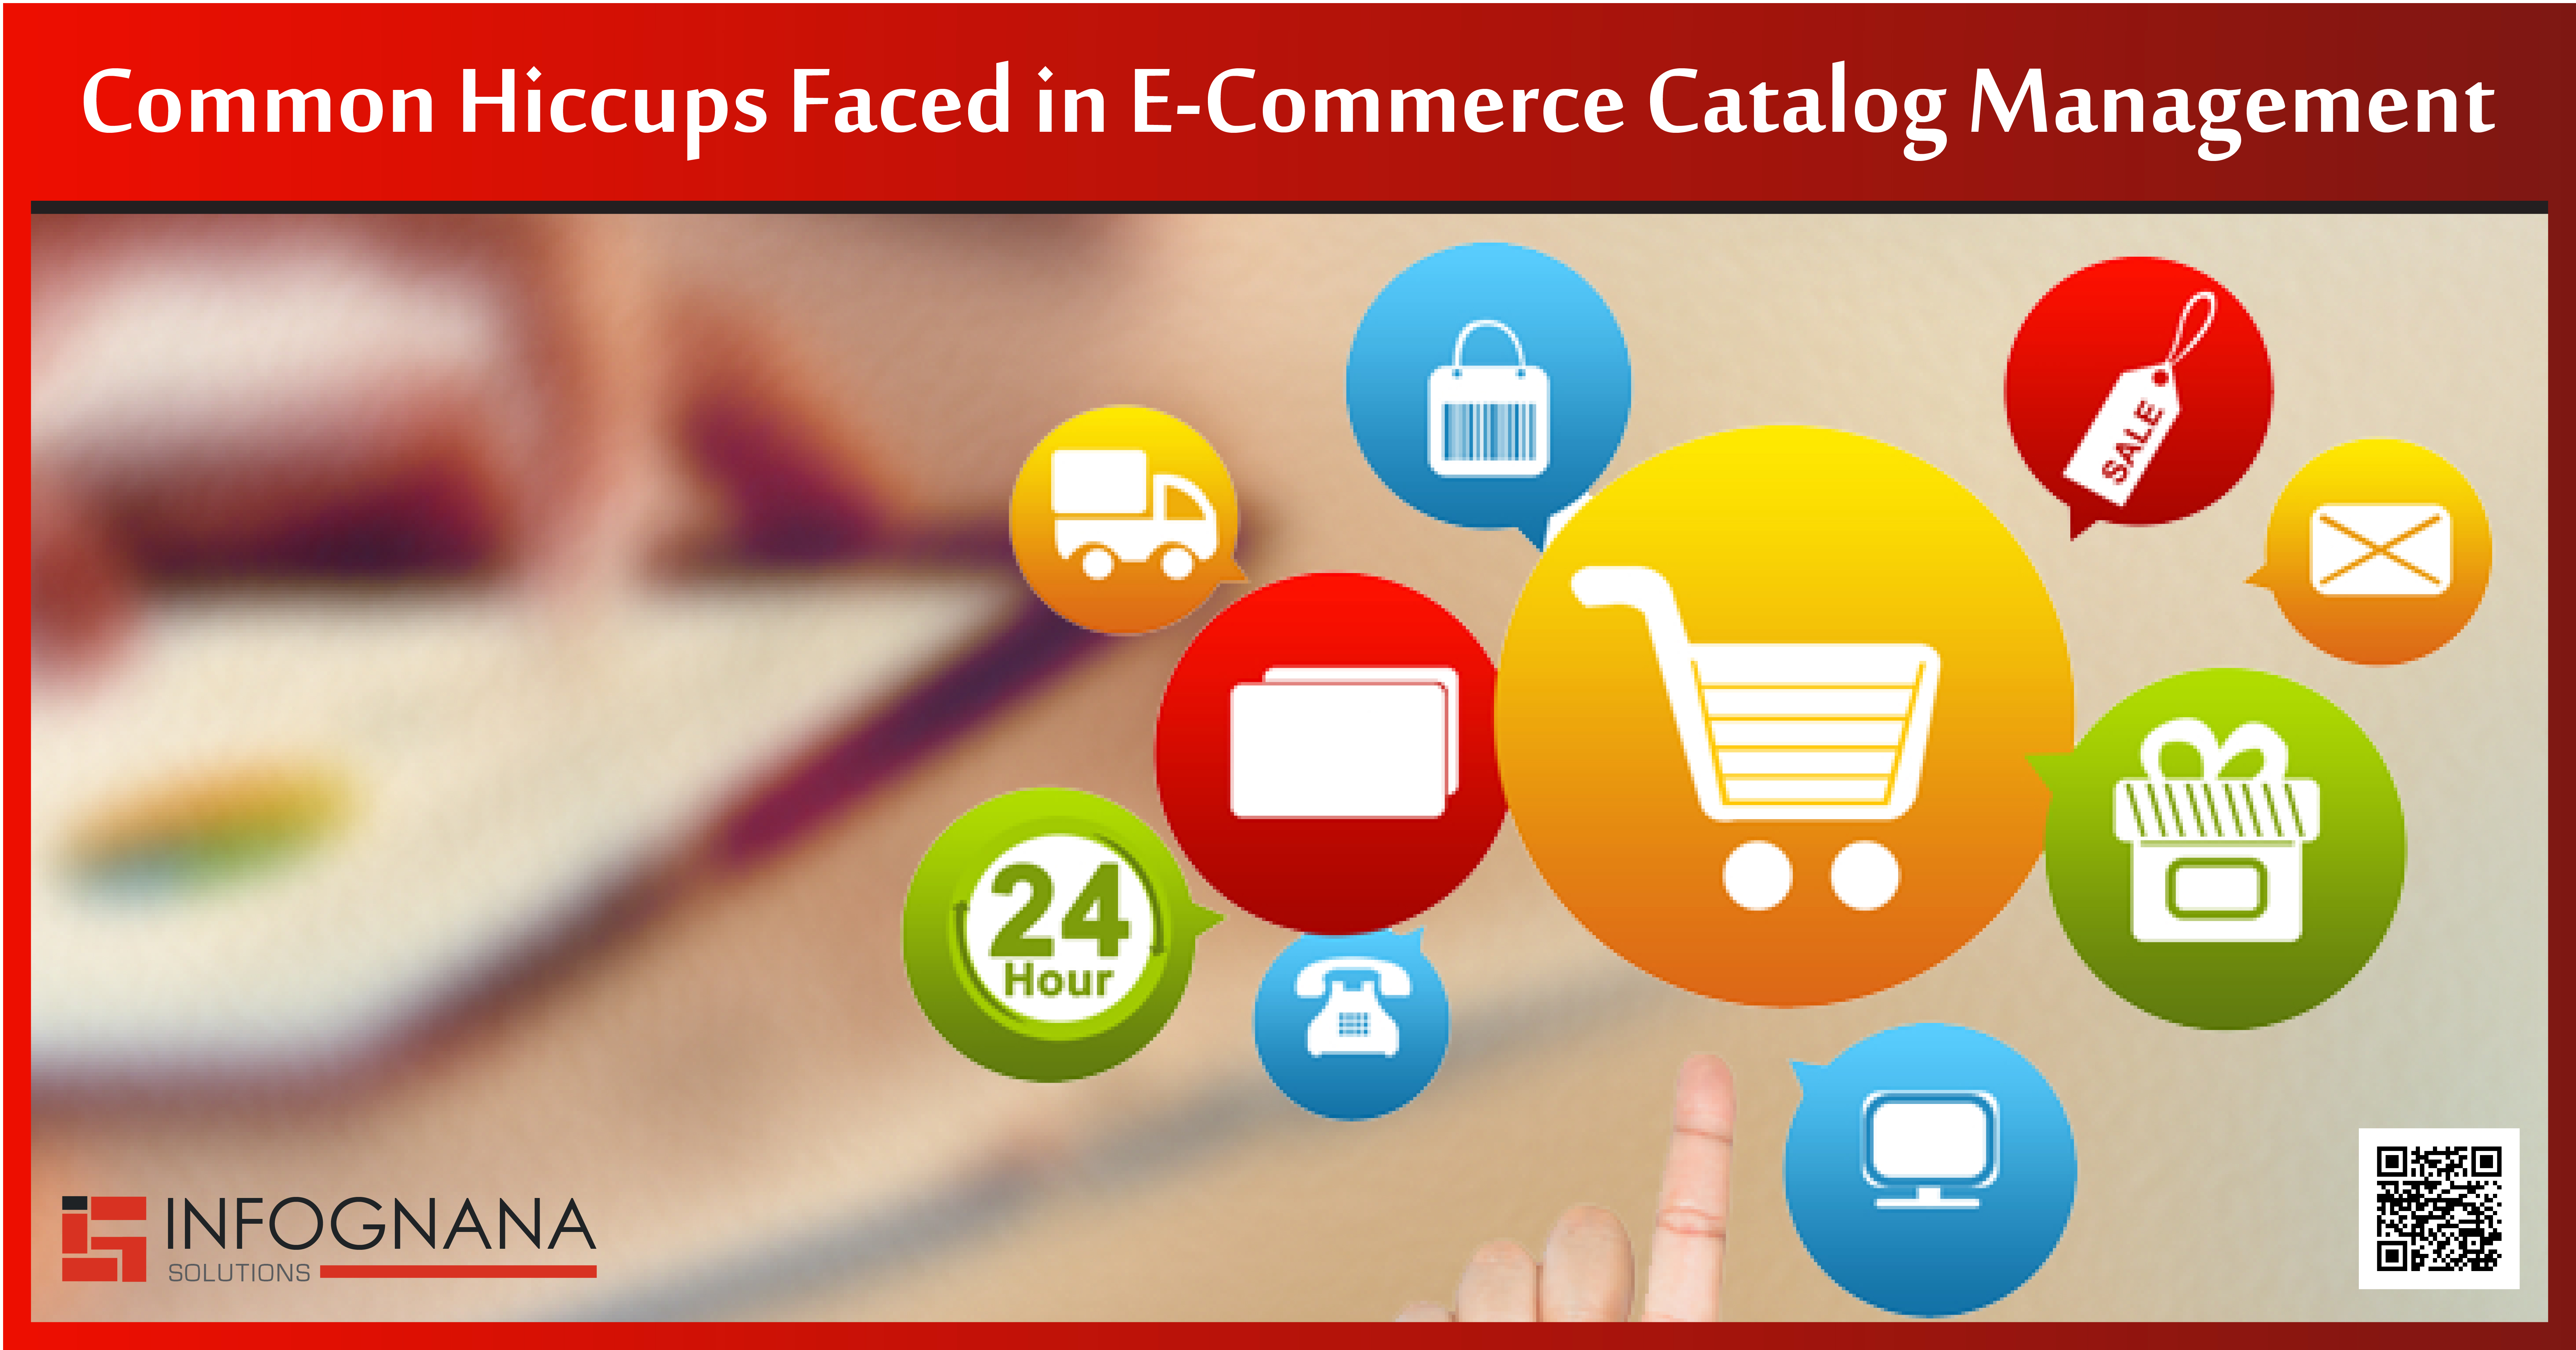 Ecommerce Catalog Management Services